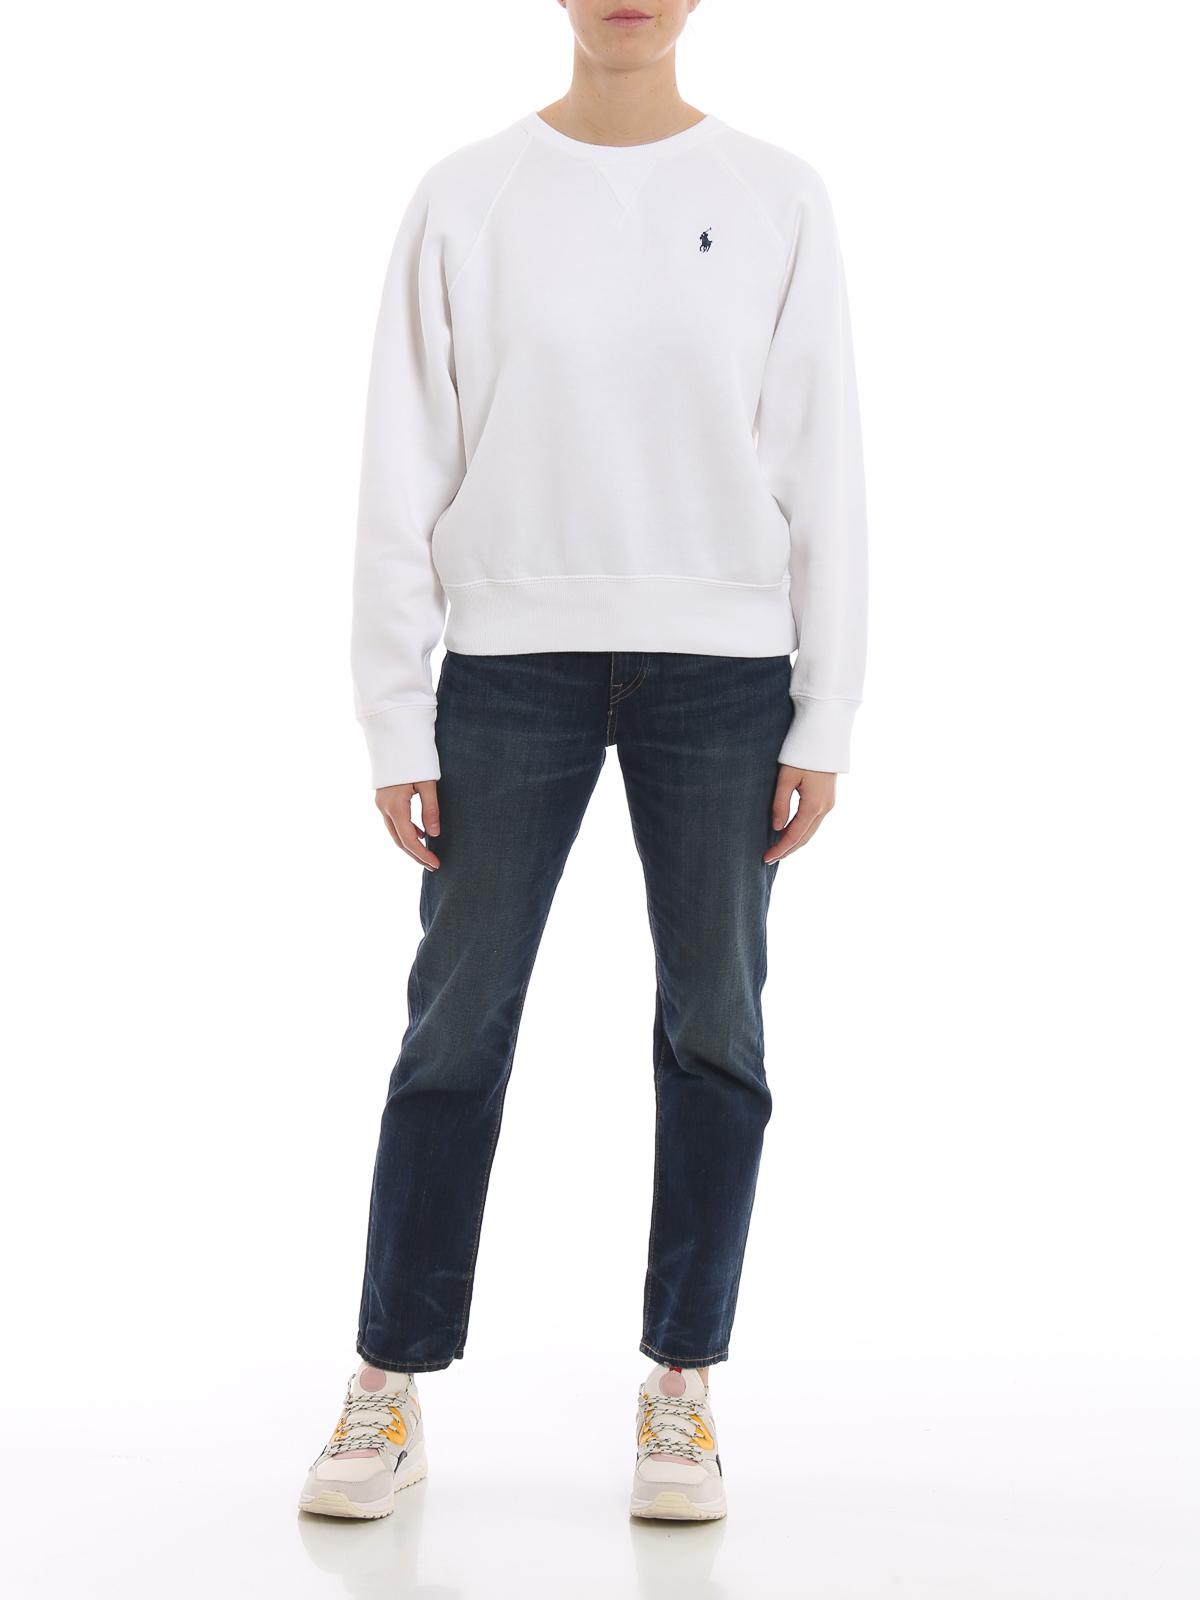 Ralph Sweatshirts White Crew Sweatshirt Polo Lauren Neck gv7fYb6y